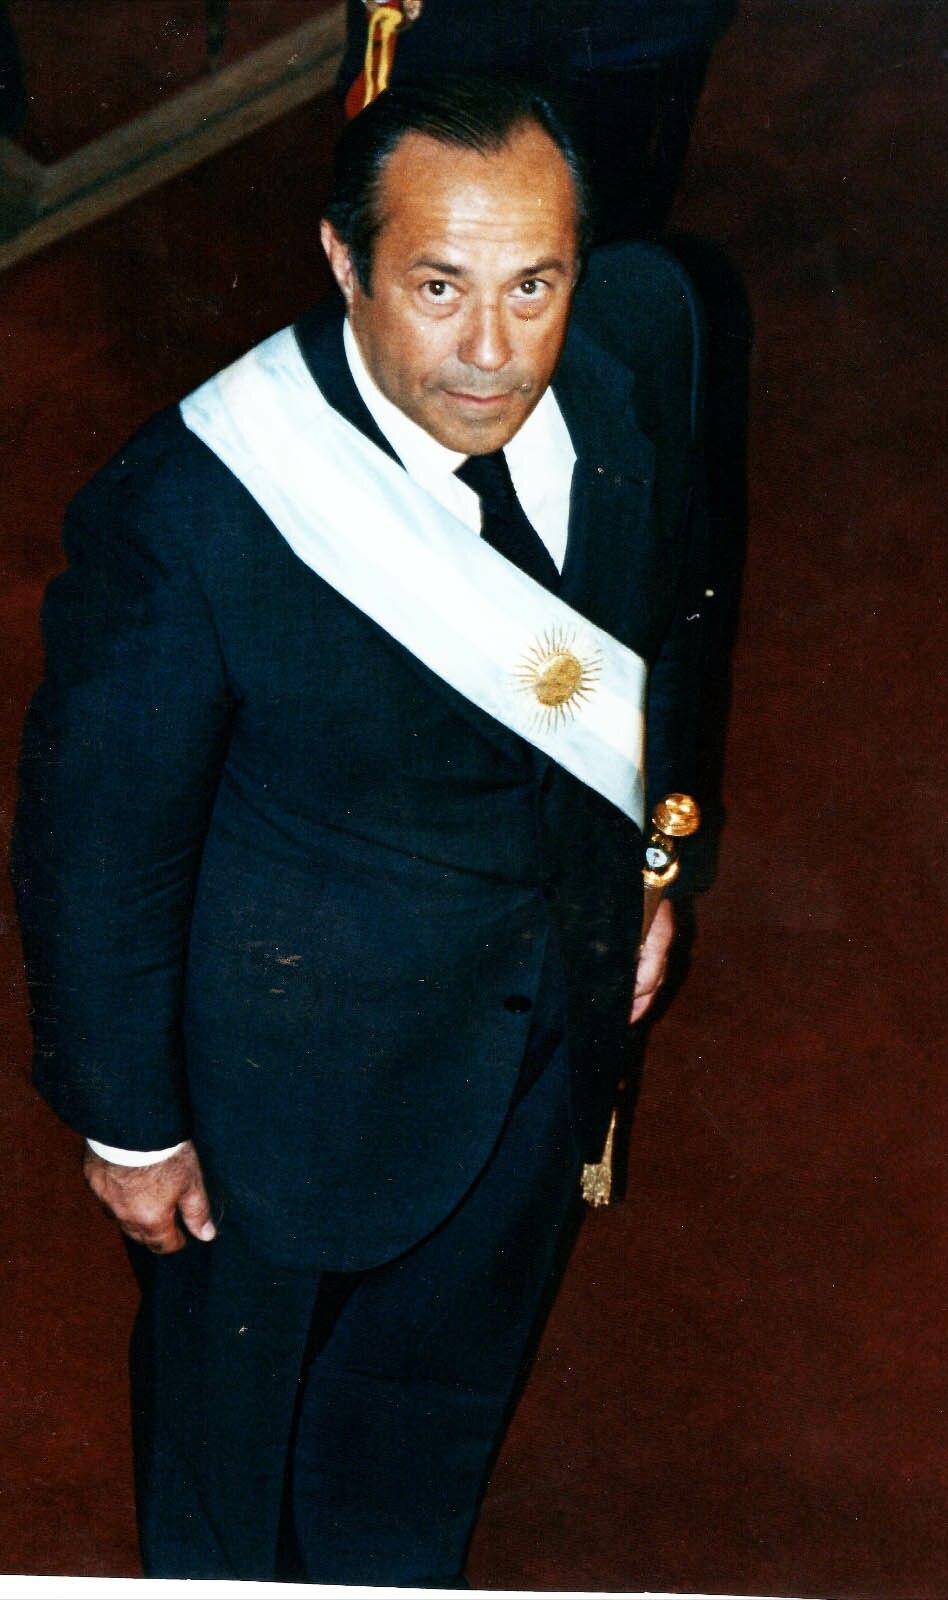 Adolfo Rodríguez Saá con banda presidencial